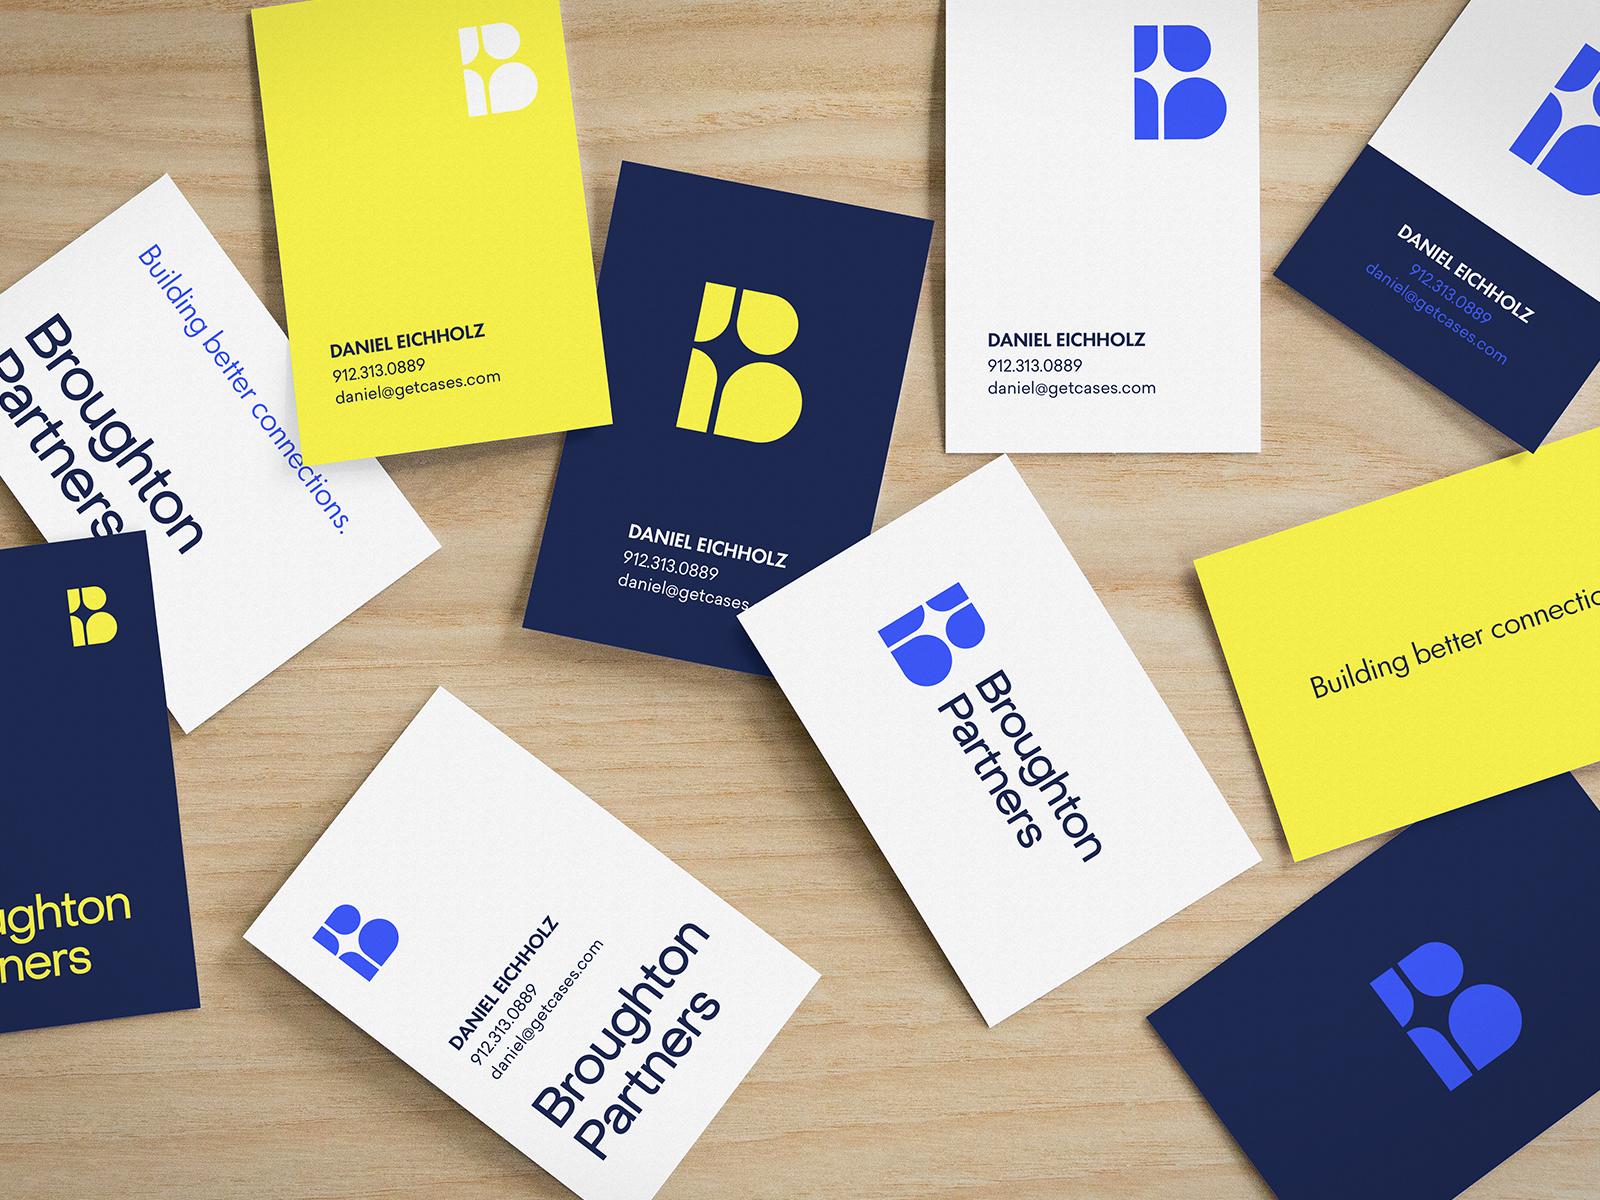 Broughton partners branding